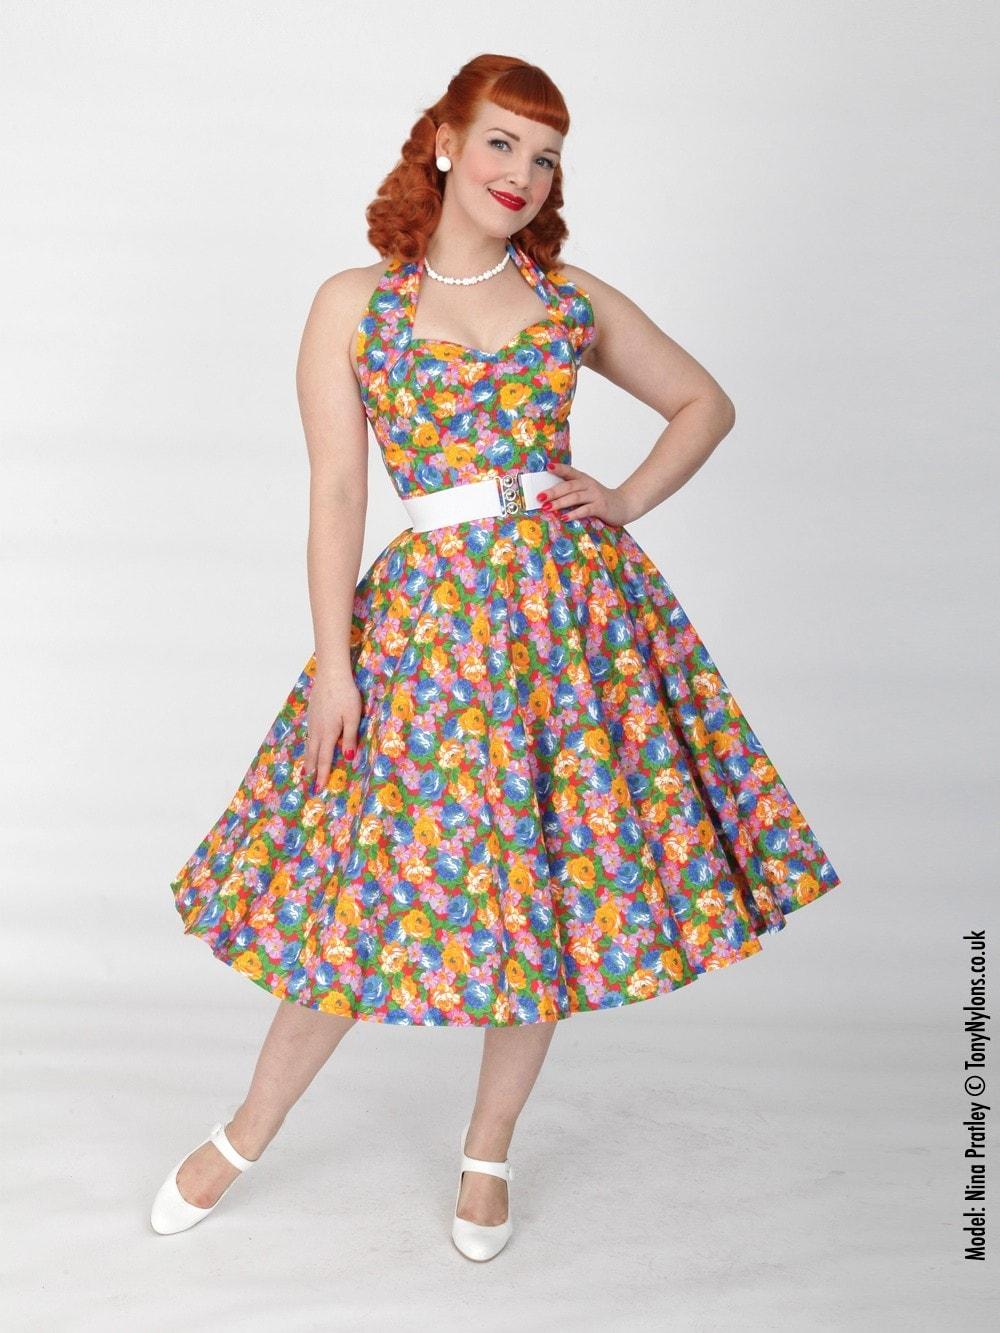 a10e4bc4 1950s Halterneck Floral Fiesta Dress from Vivien of Holloway